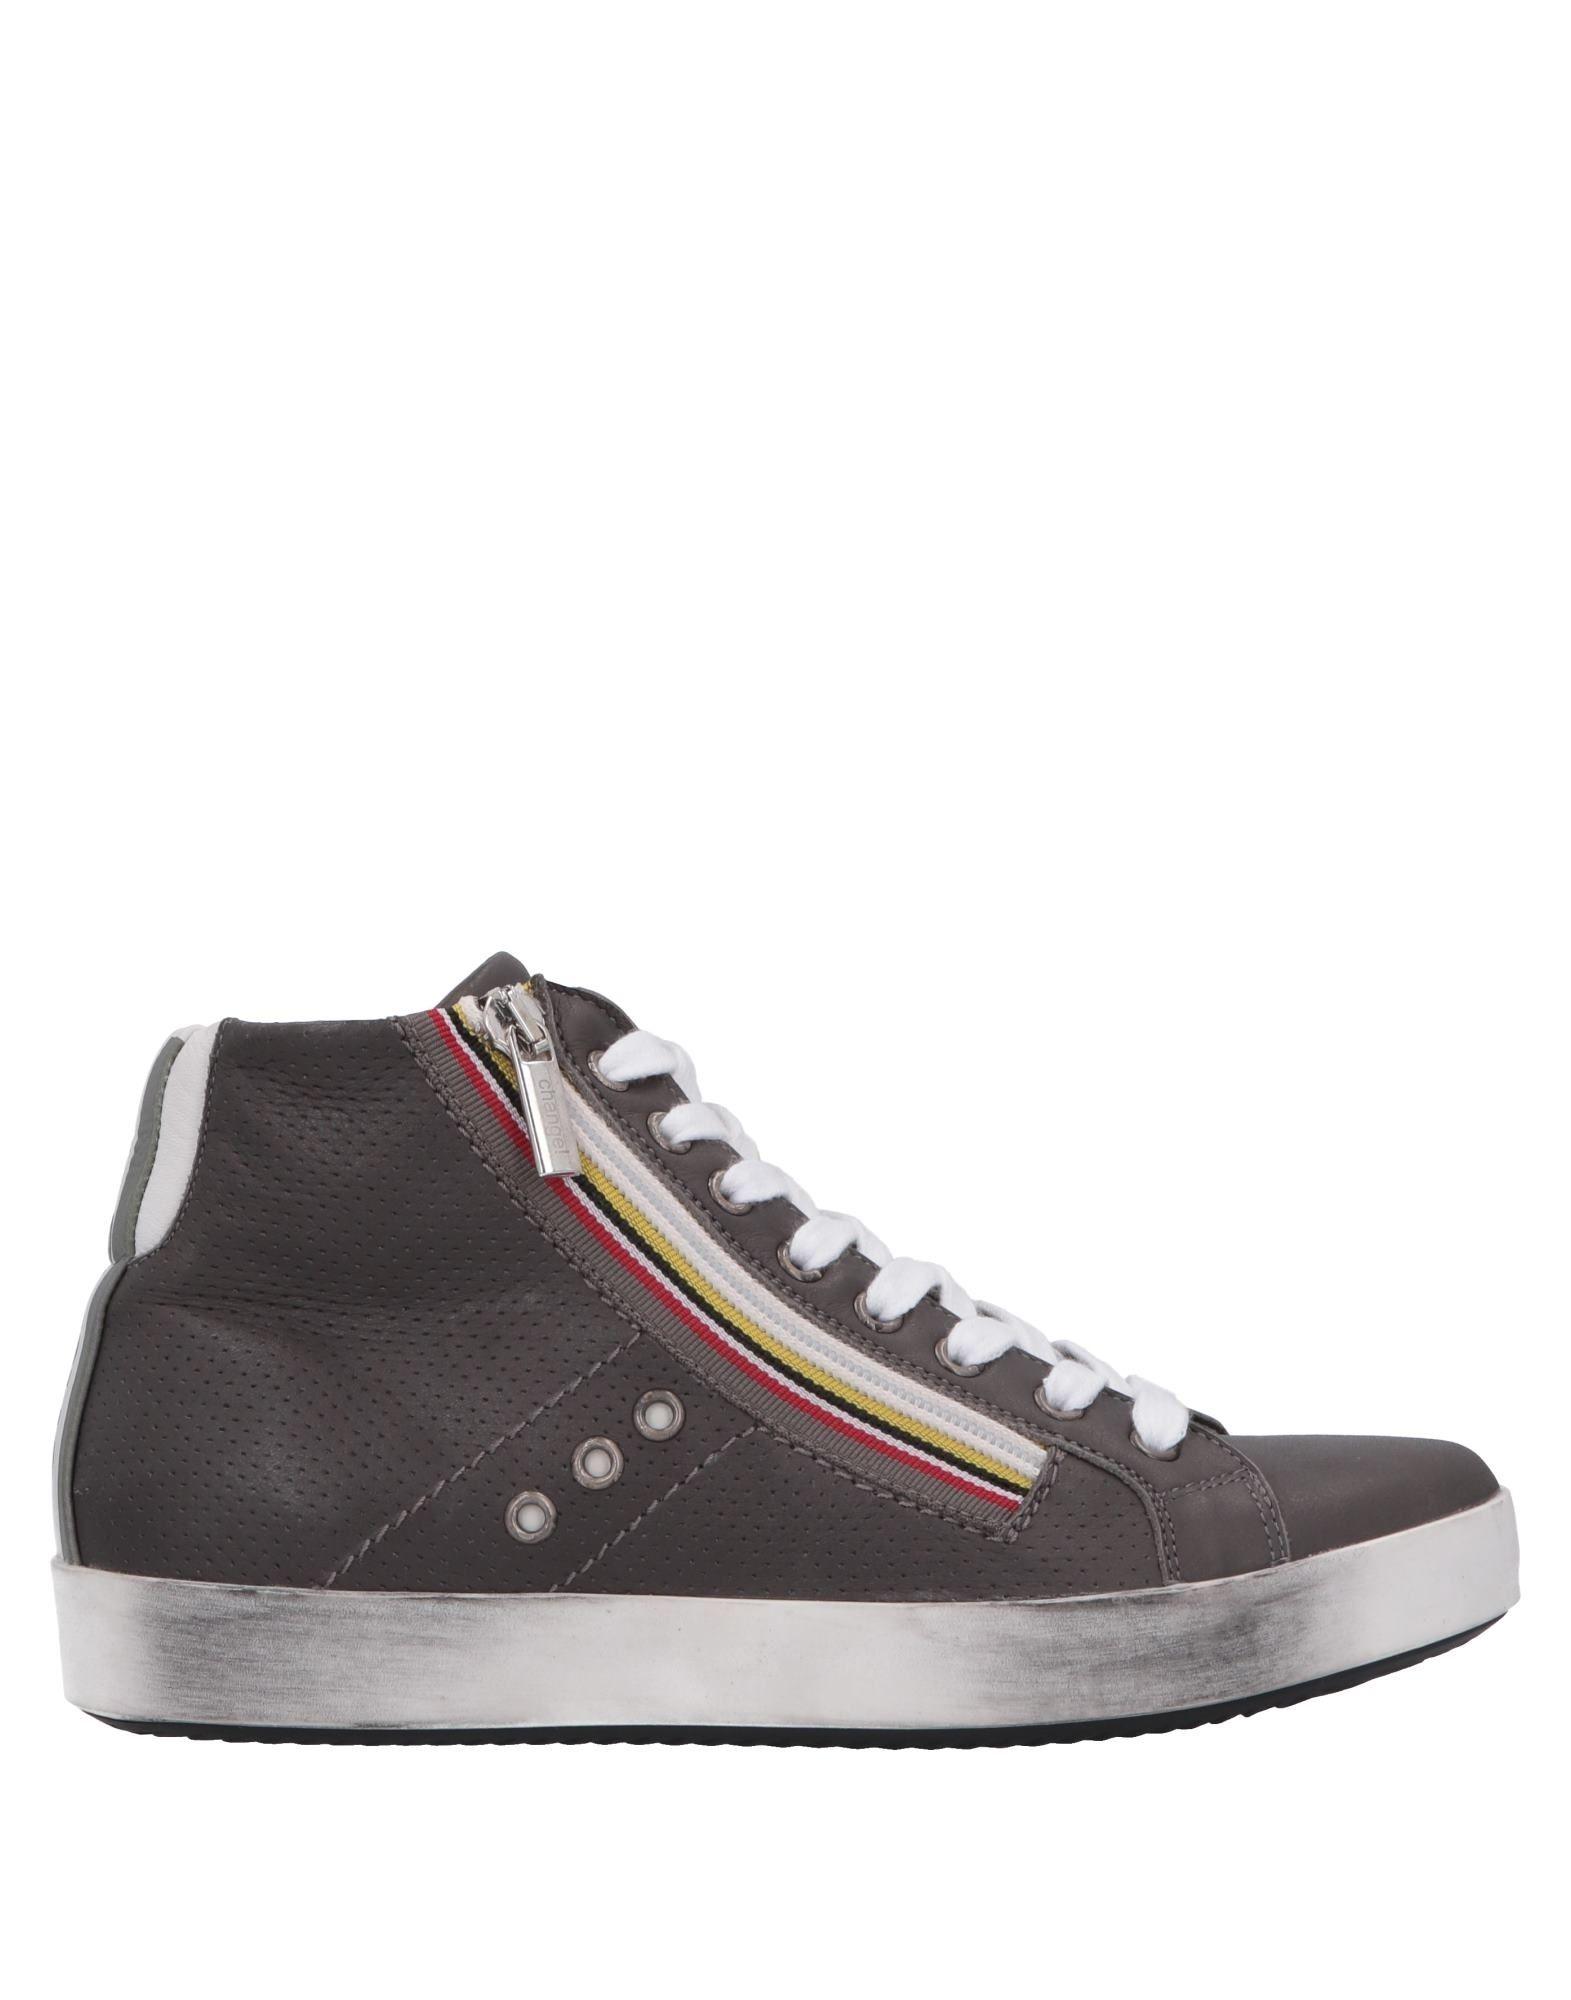 ENRICO FANTINI CHANGE! Высокие кеды и кроссовки enrico fantini низкие кеды и кроссовки